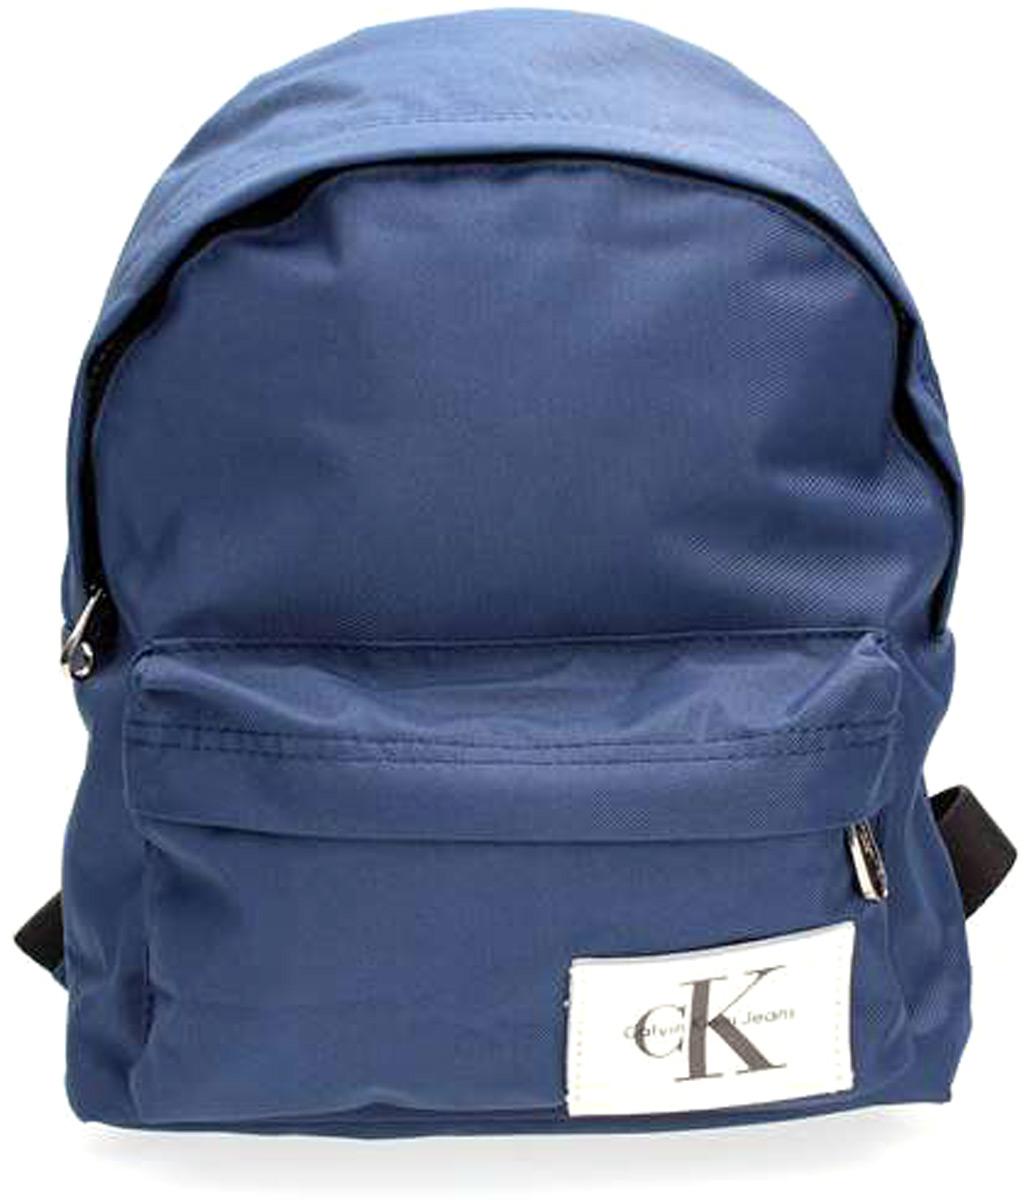 Рюкзак мужской Calvin Klein Jeans, цвет: синий. K40K400043/437 рюкзак мужской calvin klein jeans цвет синий k40k400043 4400